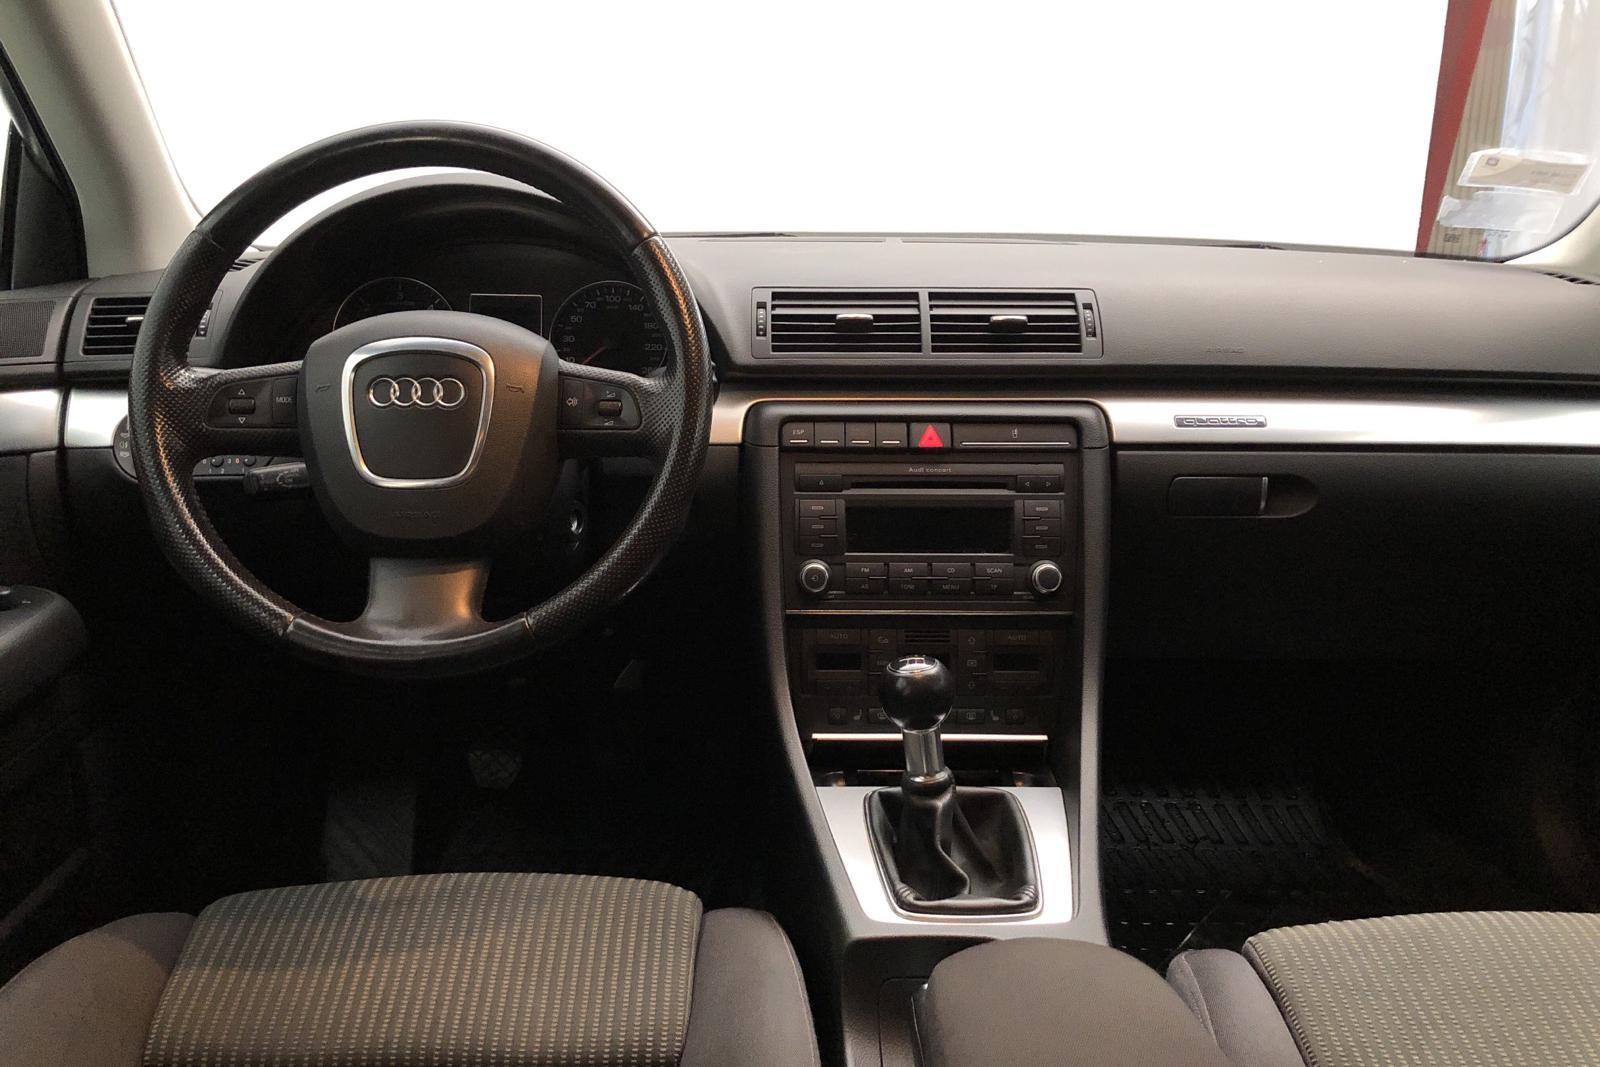 Audi A4 2.0 TDI Avant quattro (140hk) - 256 000 km - Manual - Dark Grey - 2008